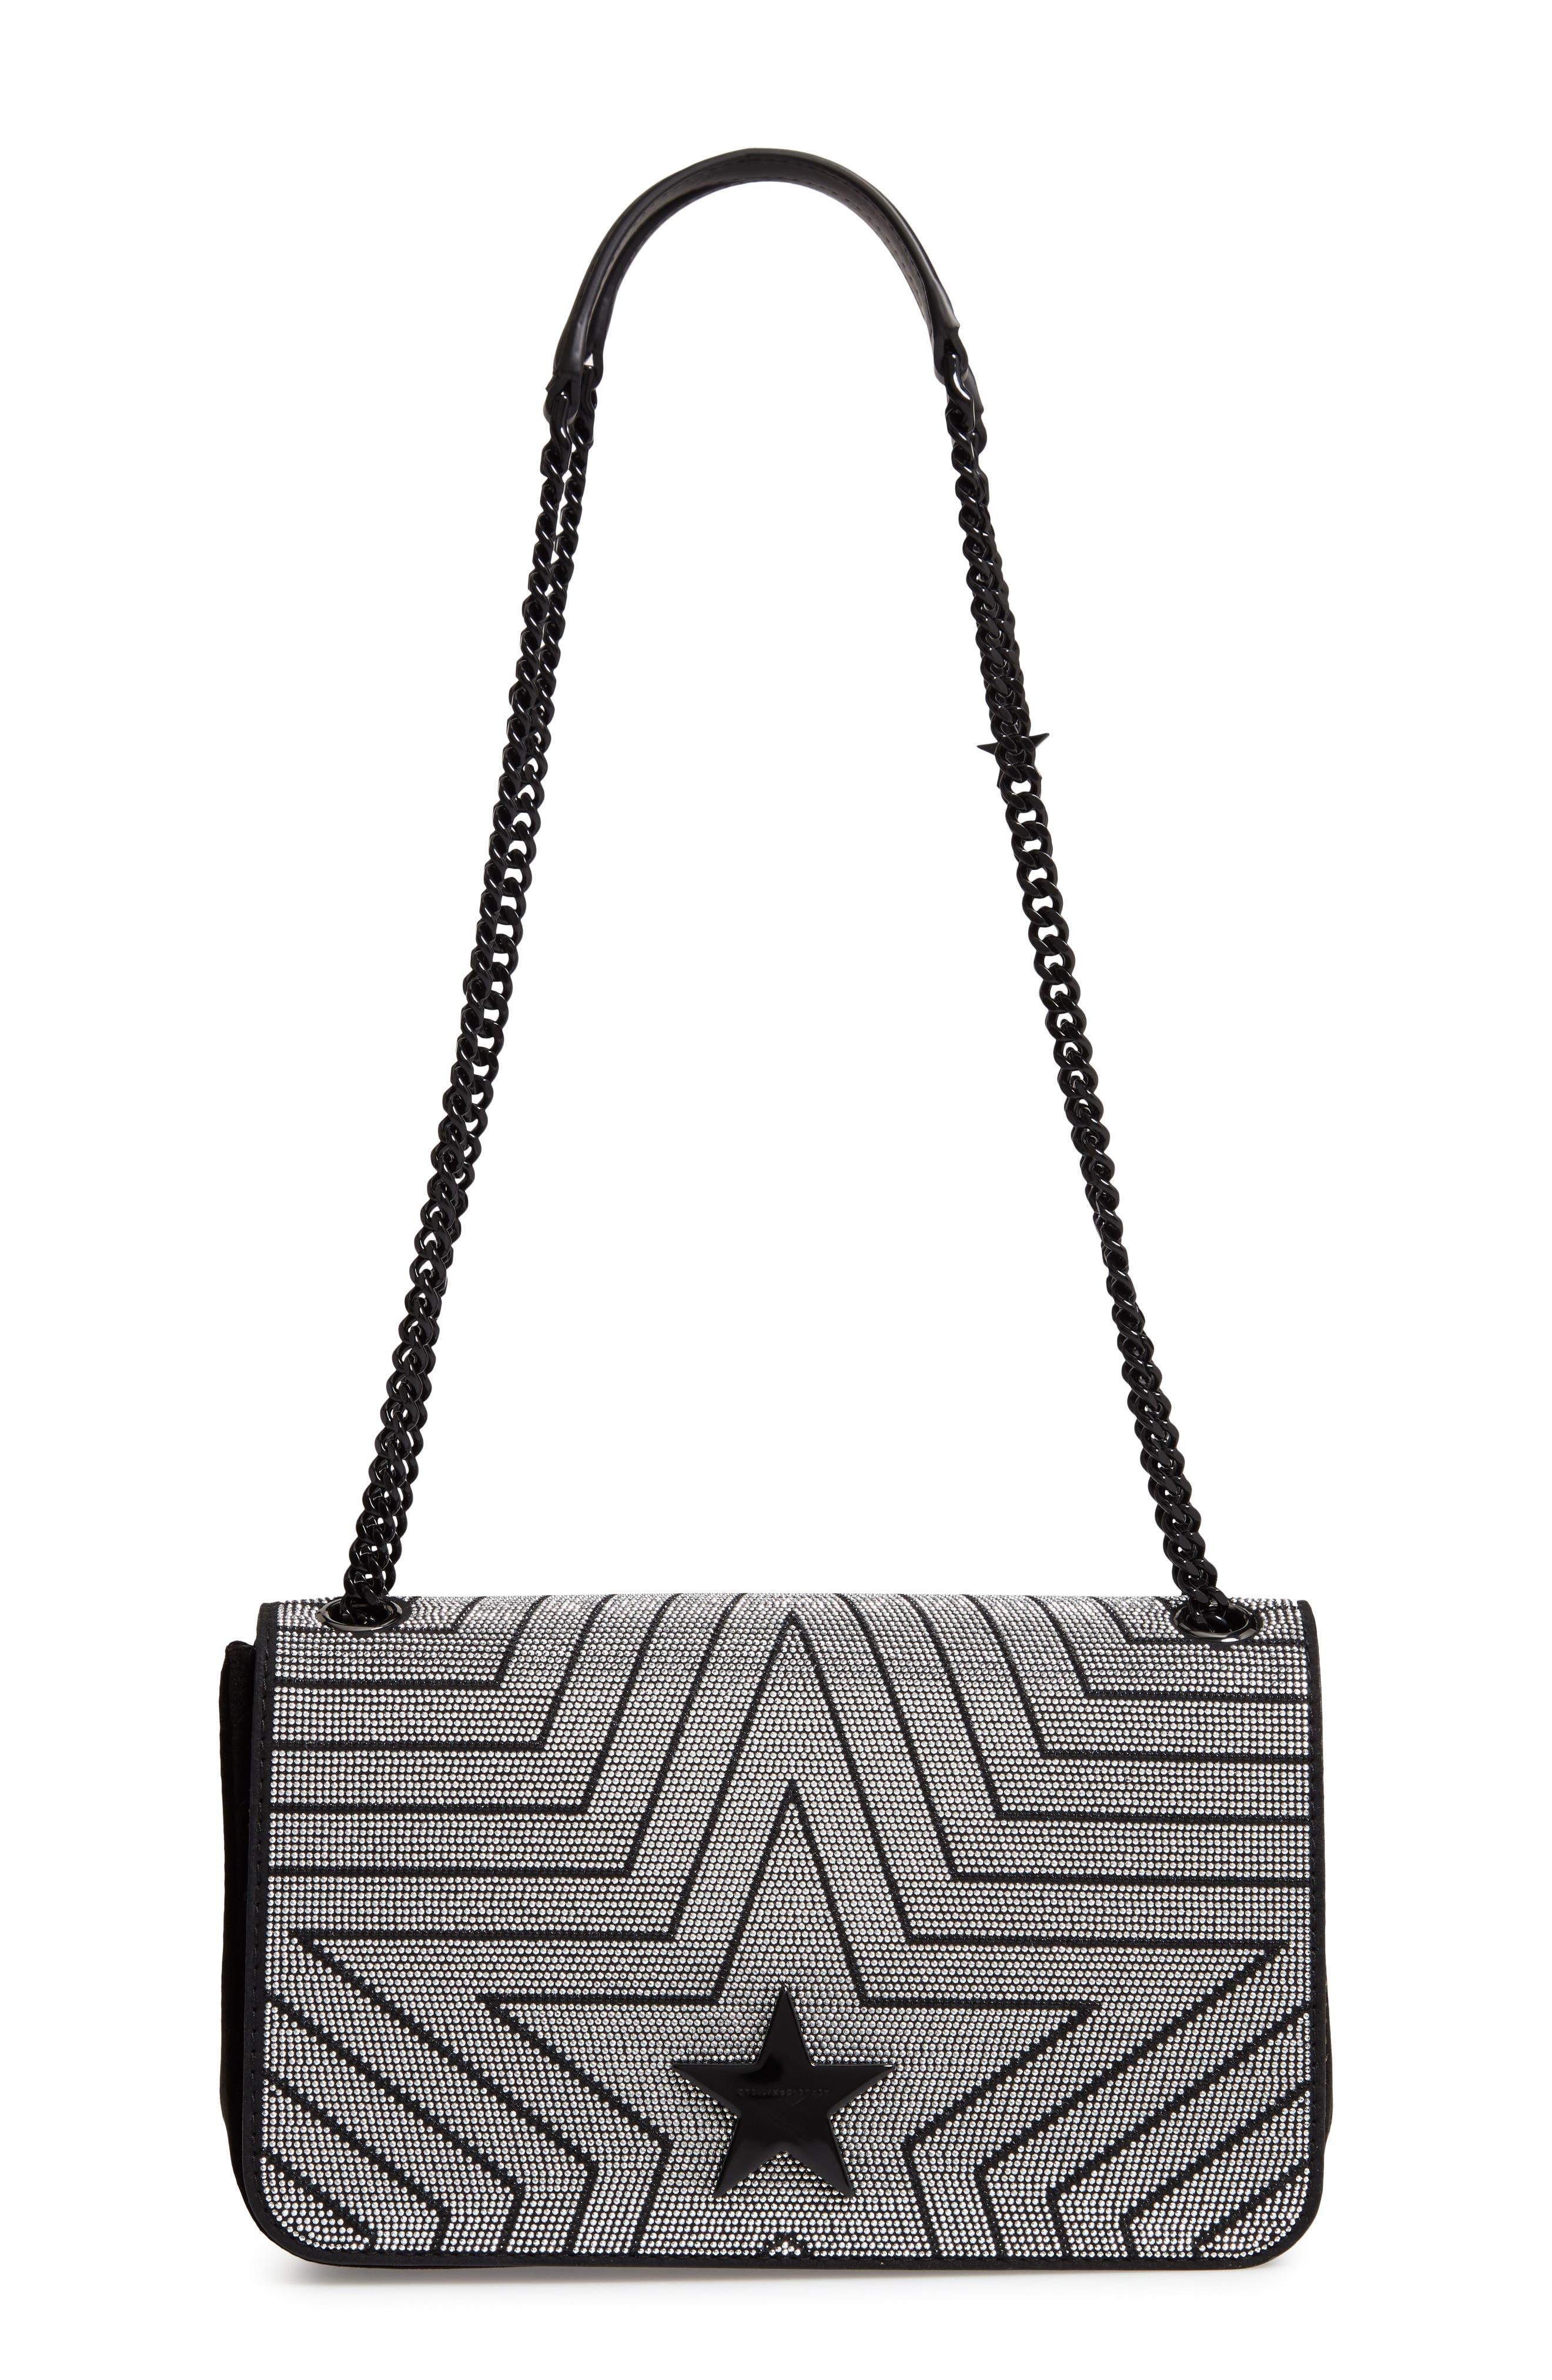 Medium Crystal Star Shoulder Bag,                             Main thumbnail 1, color,                             BLACK